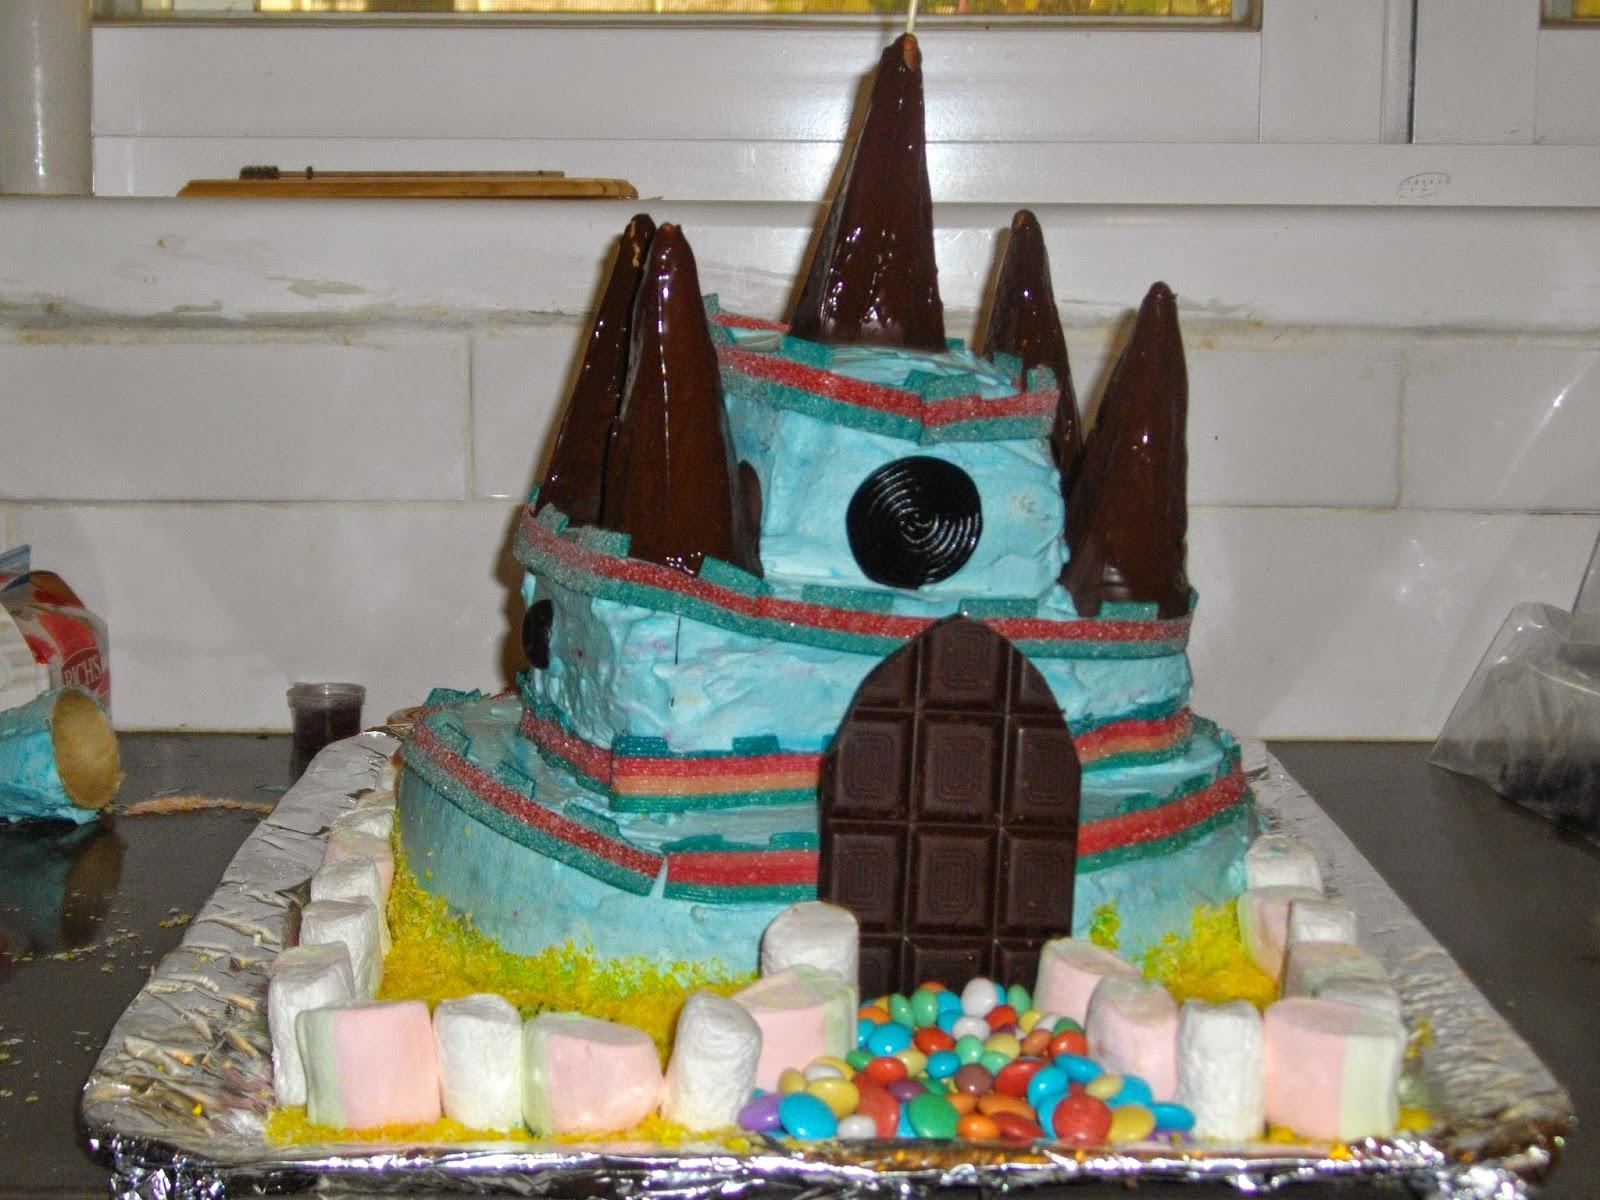 IMGP2880 - עוגת יומולדת בצורת ארמון